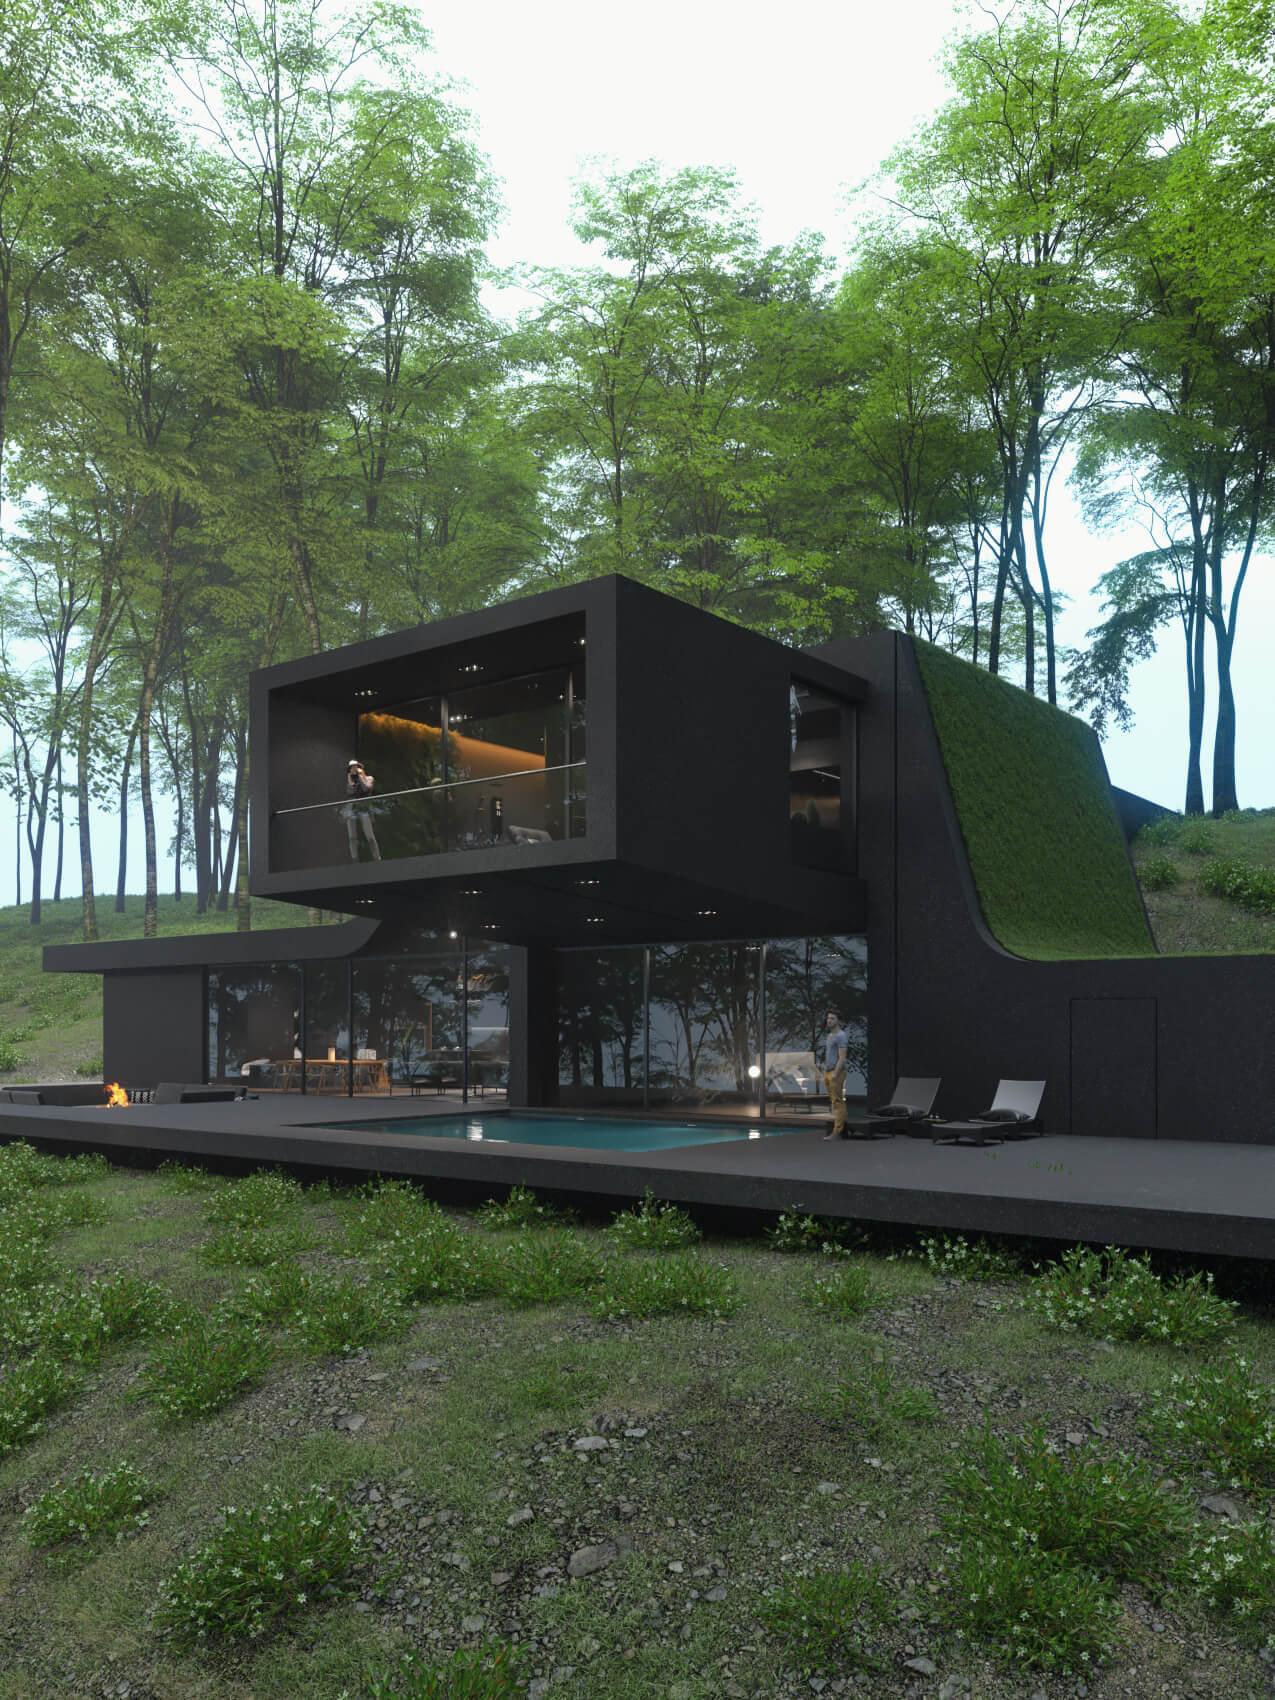 Sky Point Villa in Bedford Hills, New York, USA designed by Reza Mohtashami